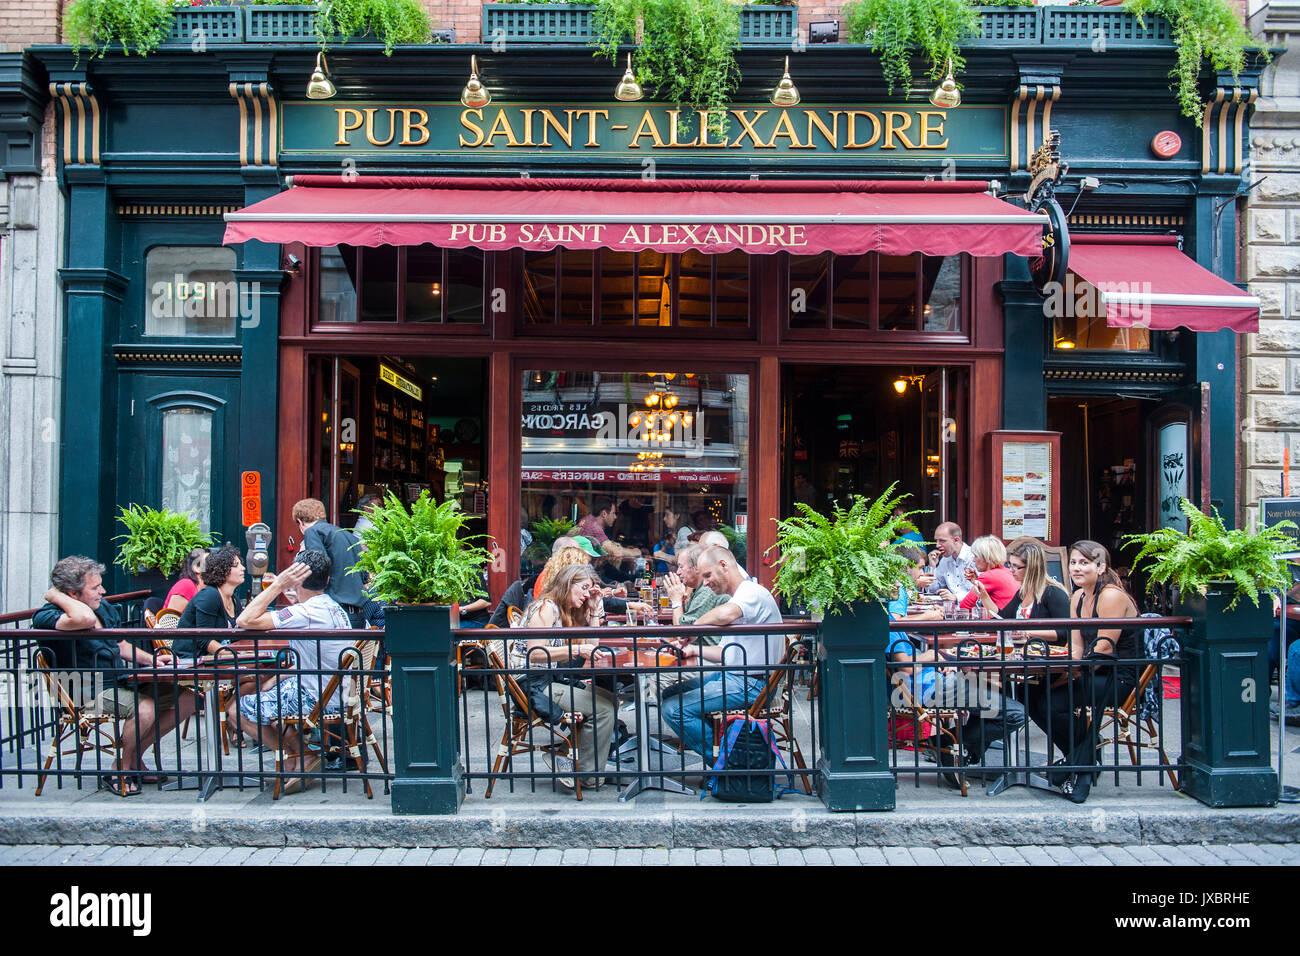 People in street restaurant, Quebec City, Quebec, Canada - Stock Image